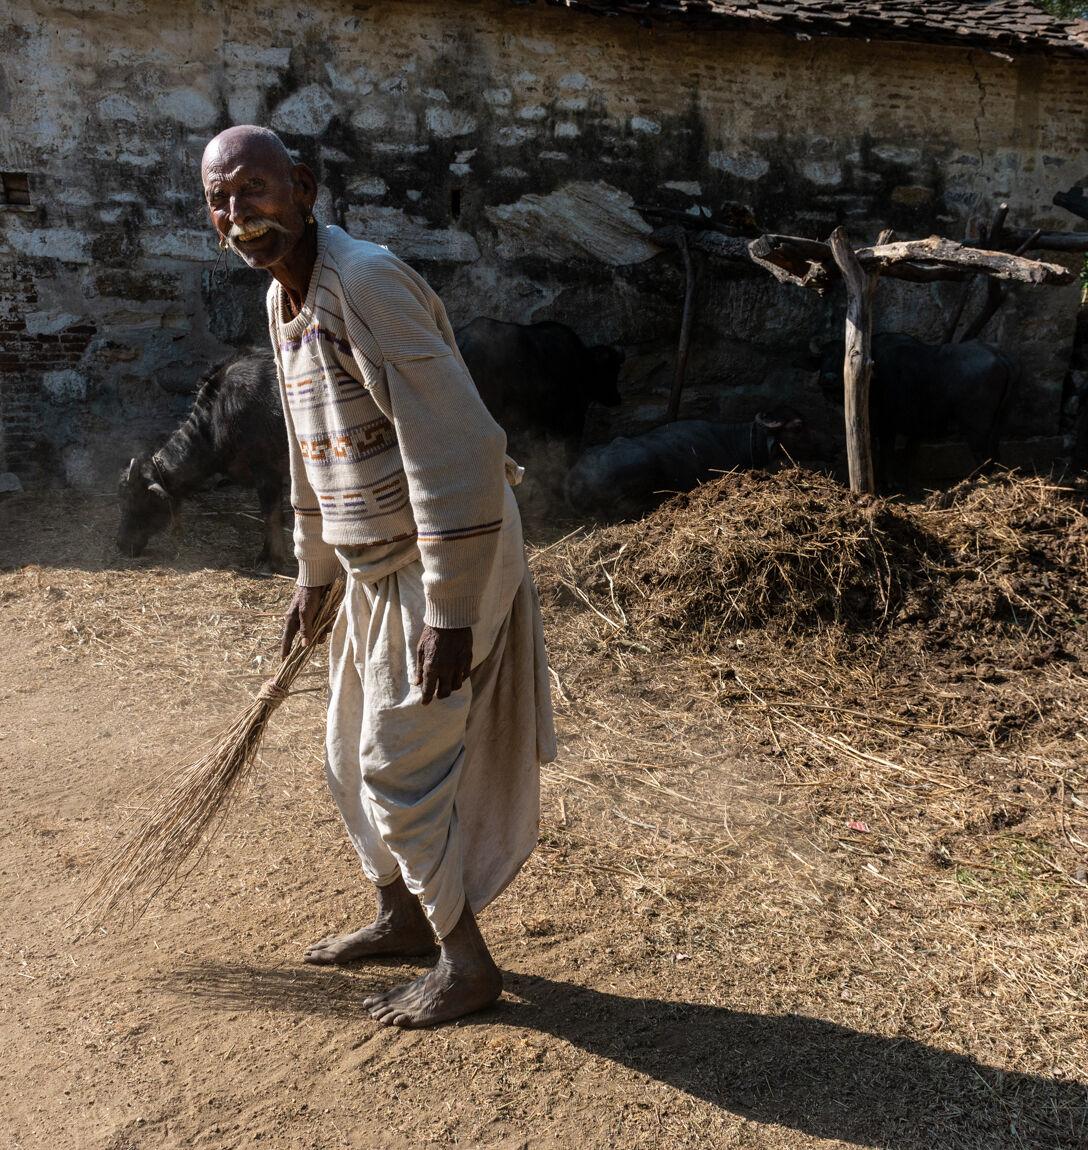 Farmer in Narlai, Rajasthan